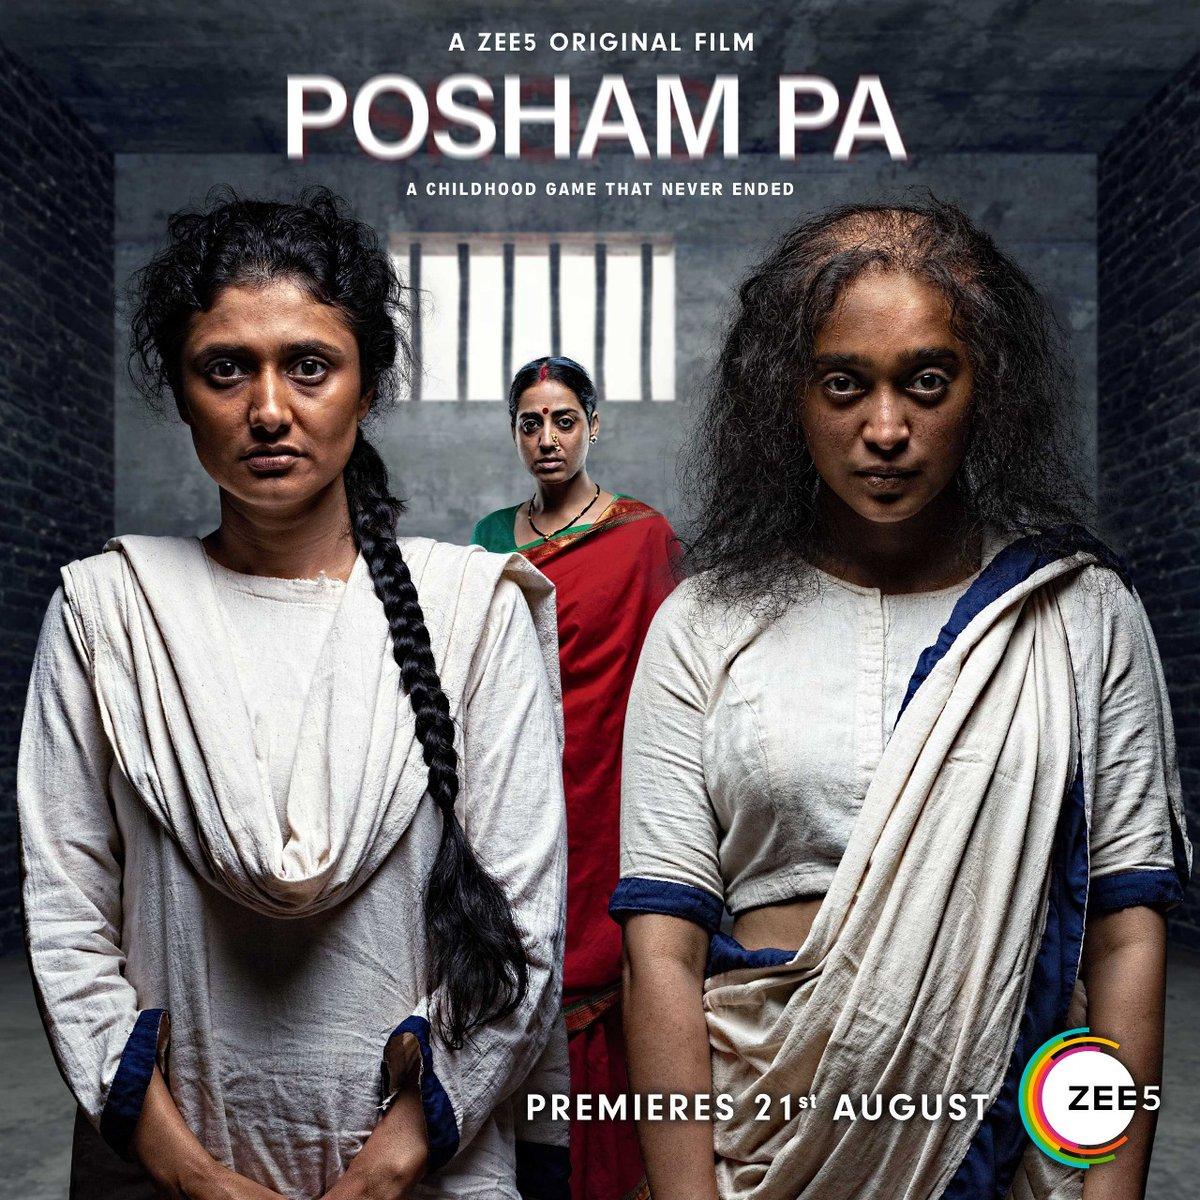 Posham Pa (TV Movie 2019) - IMDb